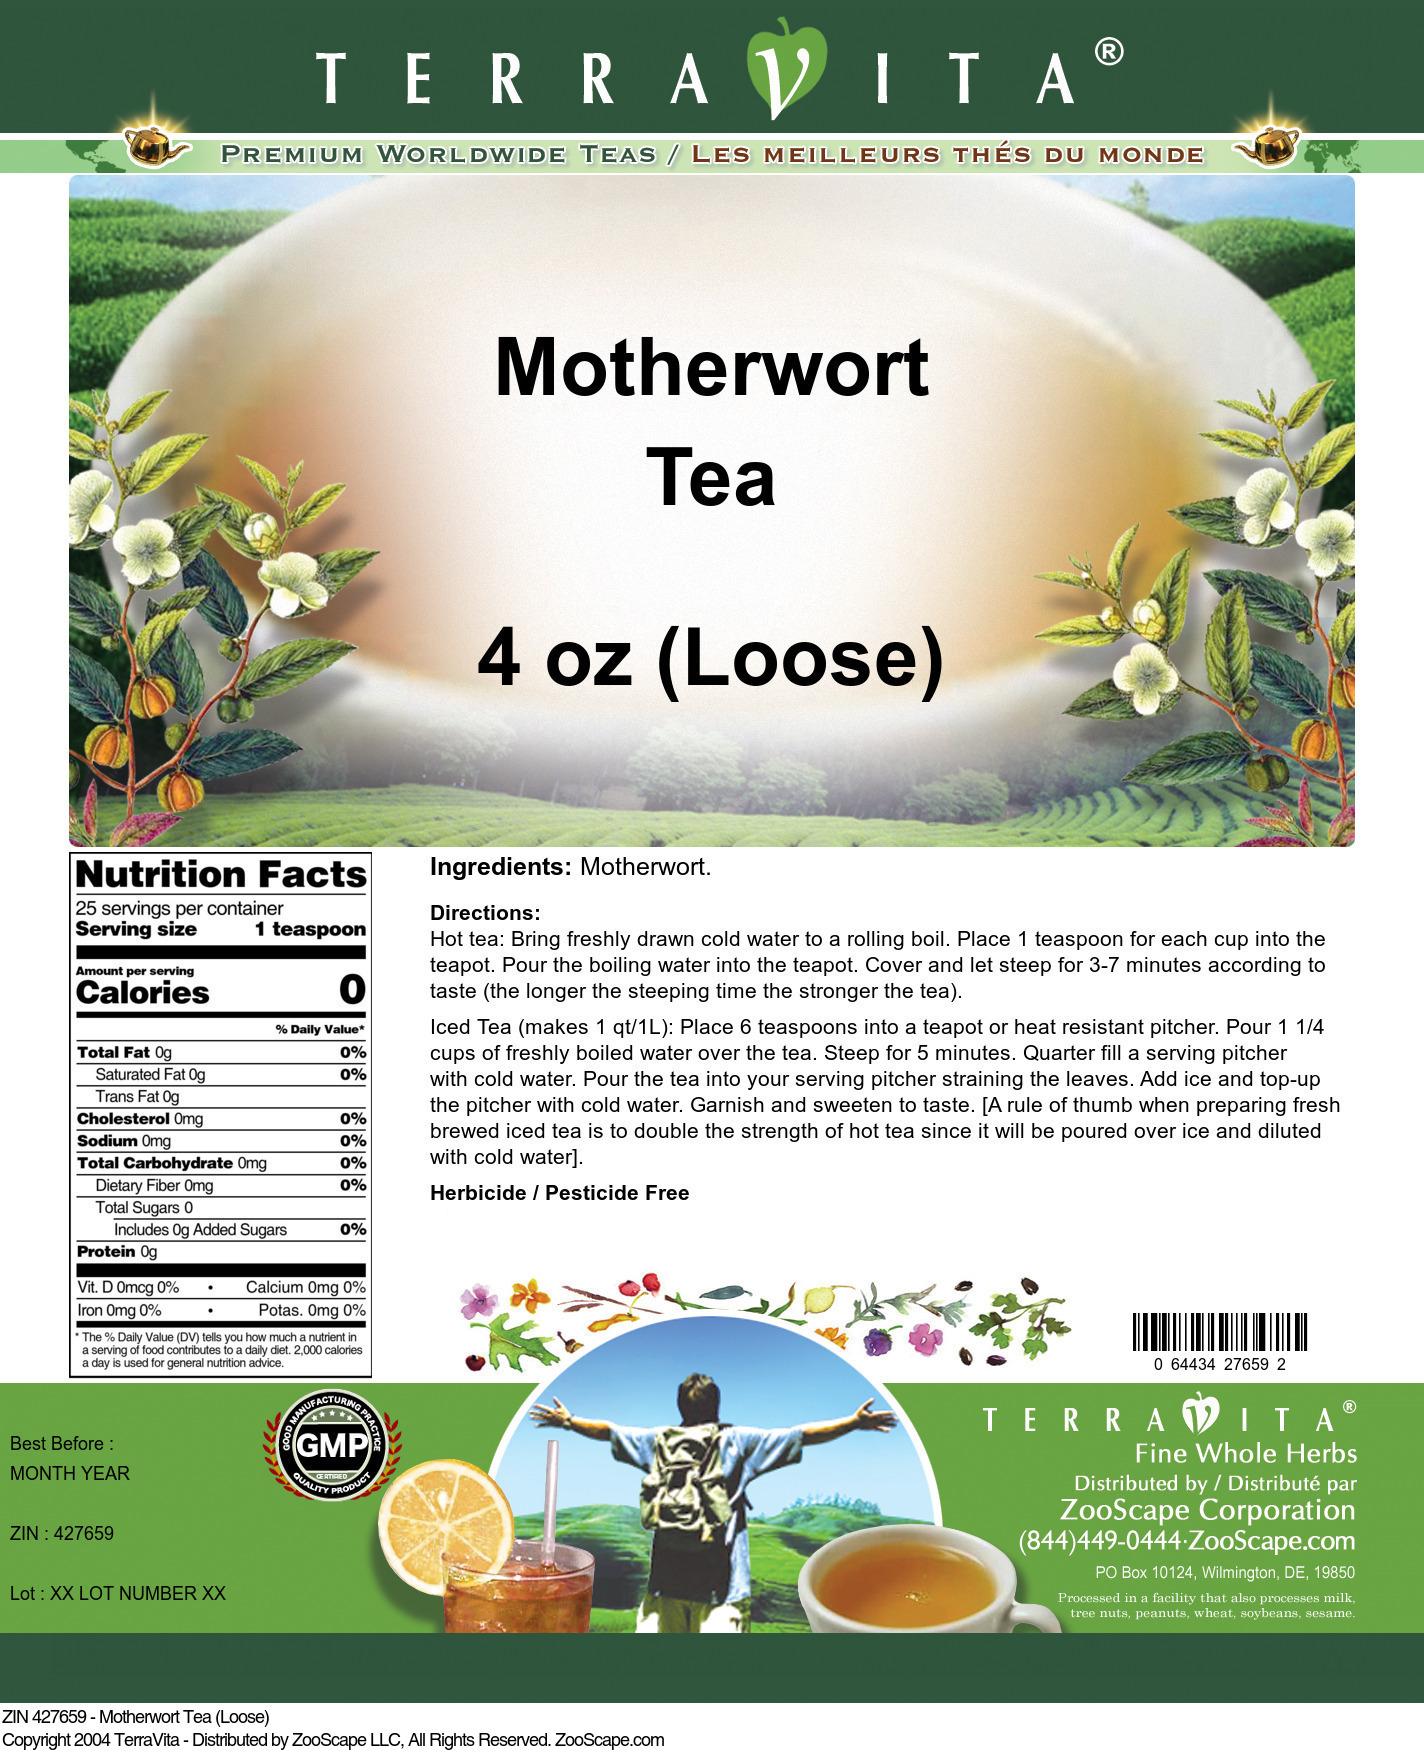 Motherwort Tea (Loose)